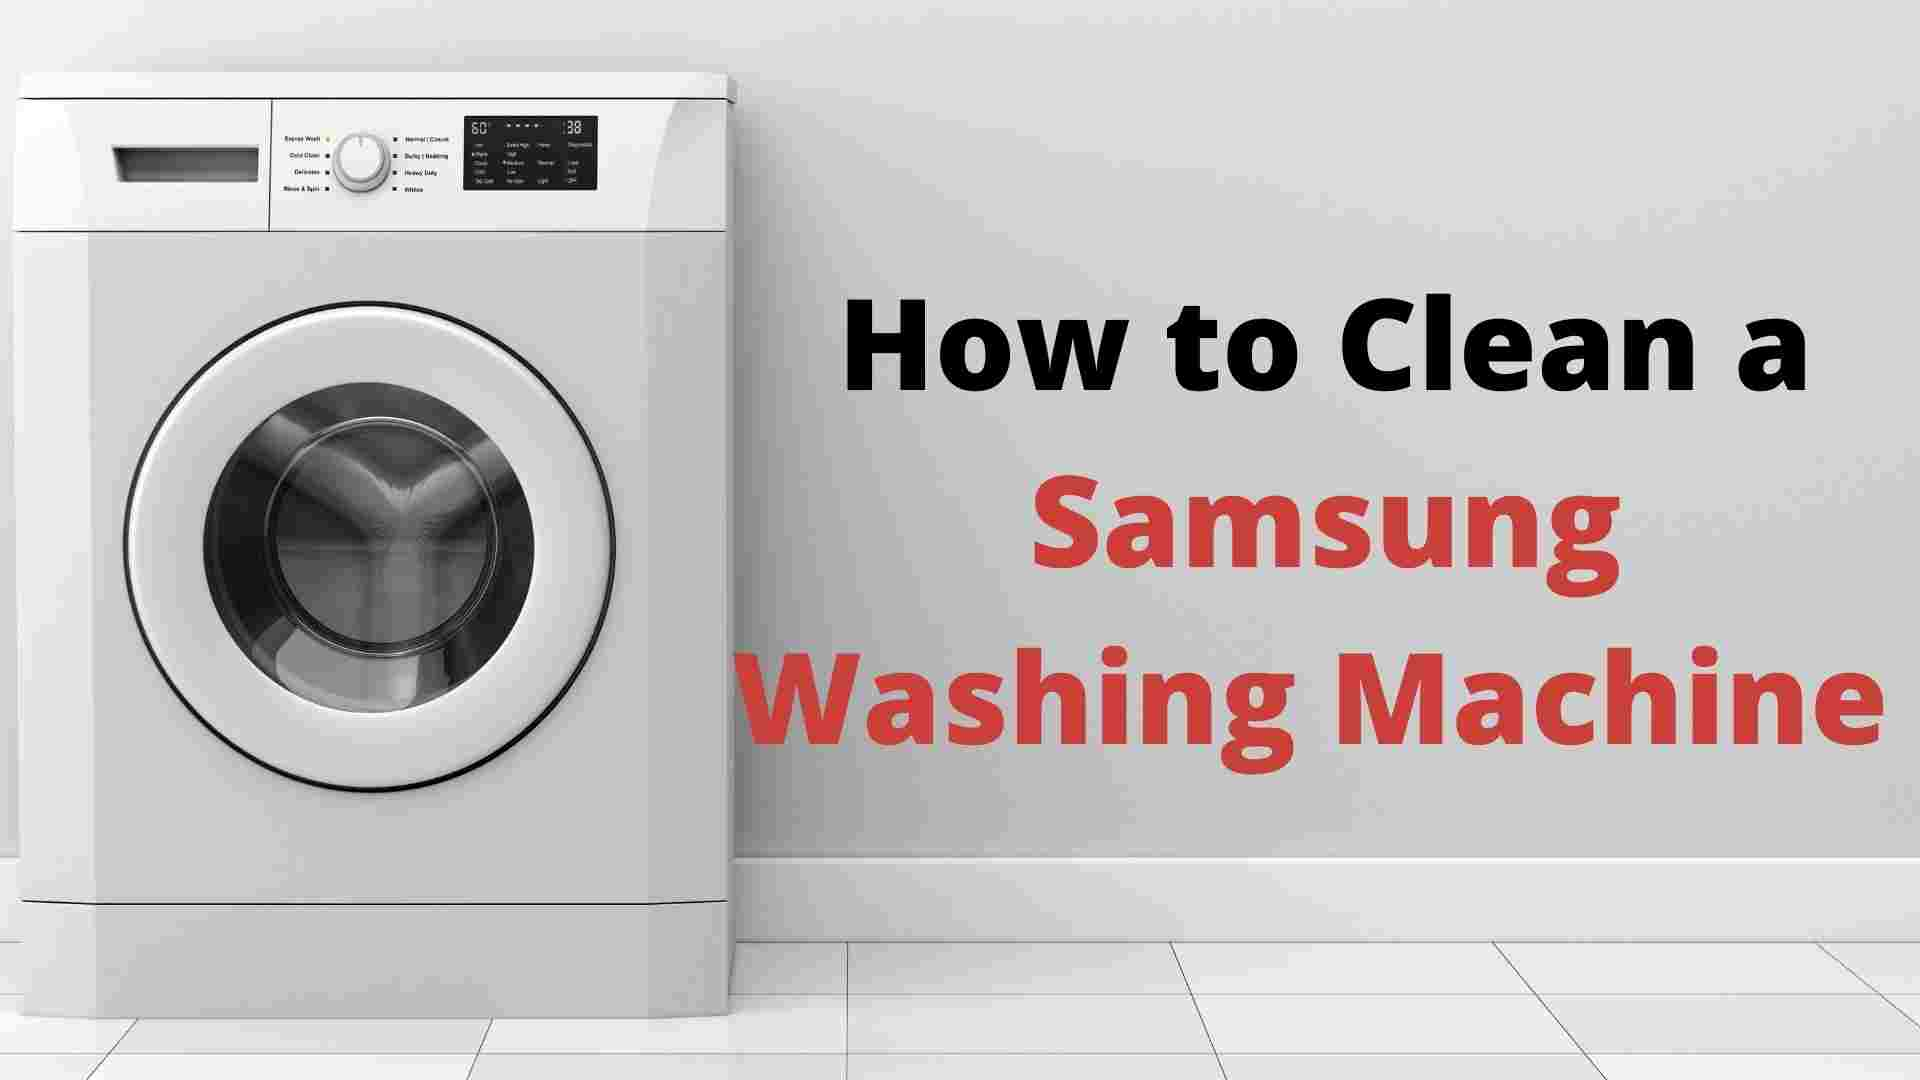 Clean a Samsung Washing Machine